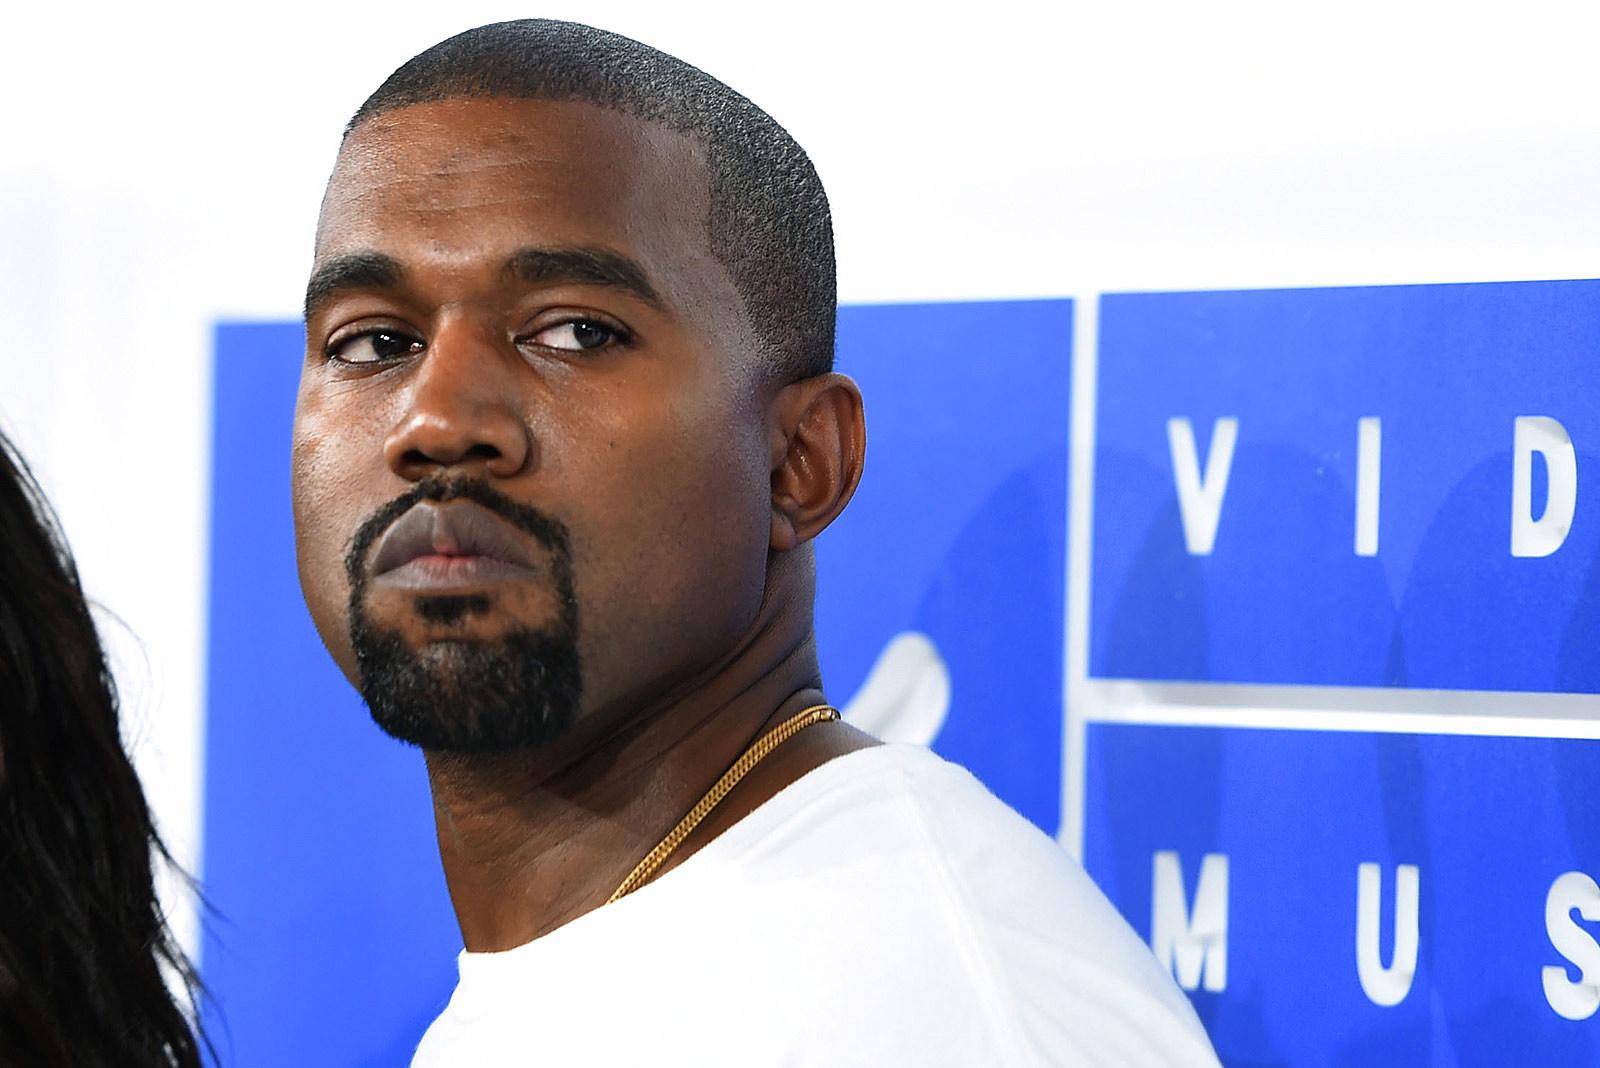 Kanye West Countersued Over Canceled 'Saint Pablo' Tour